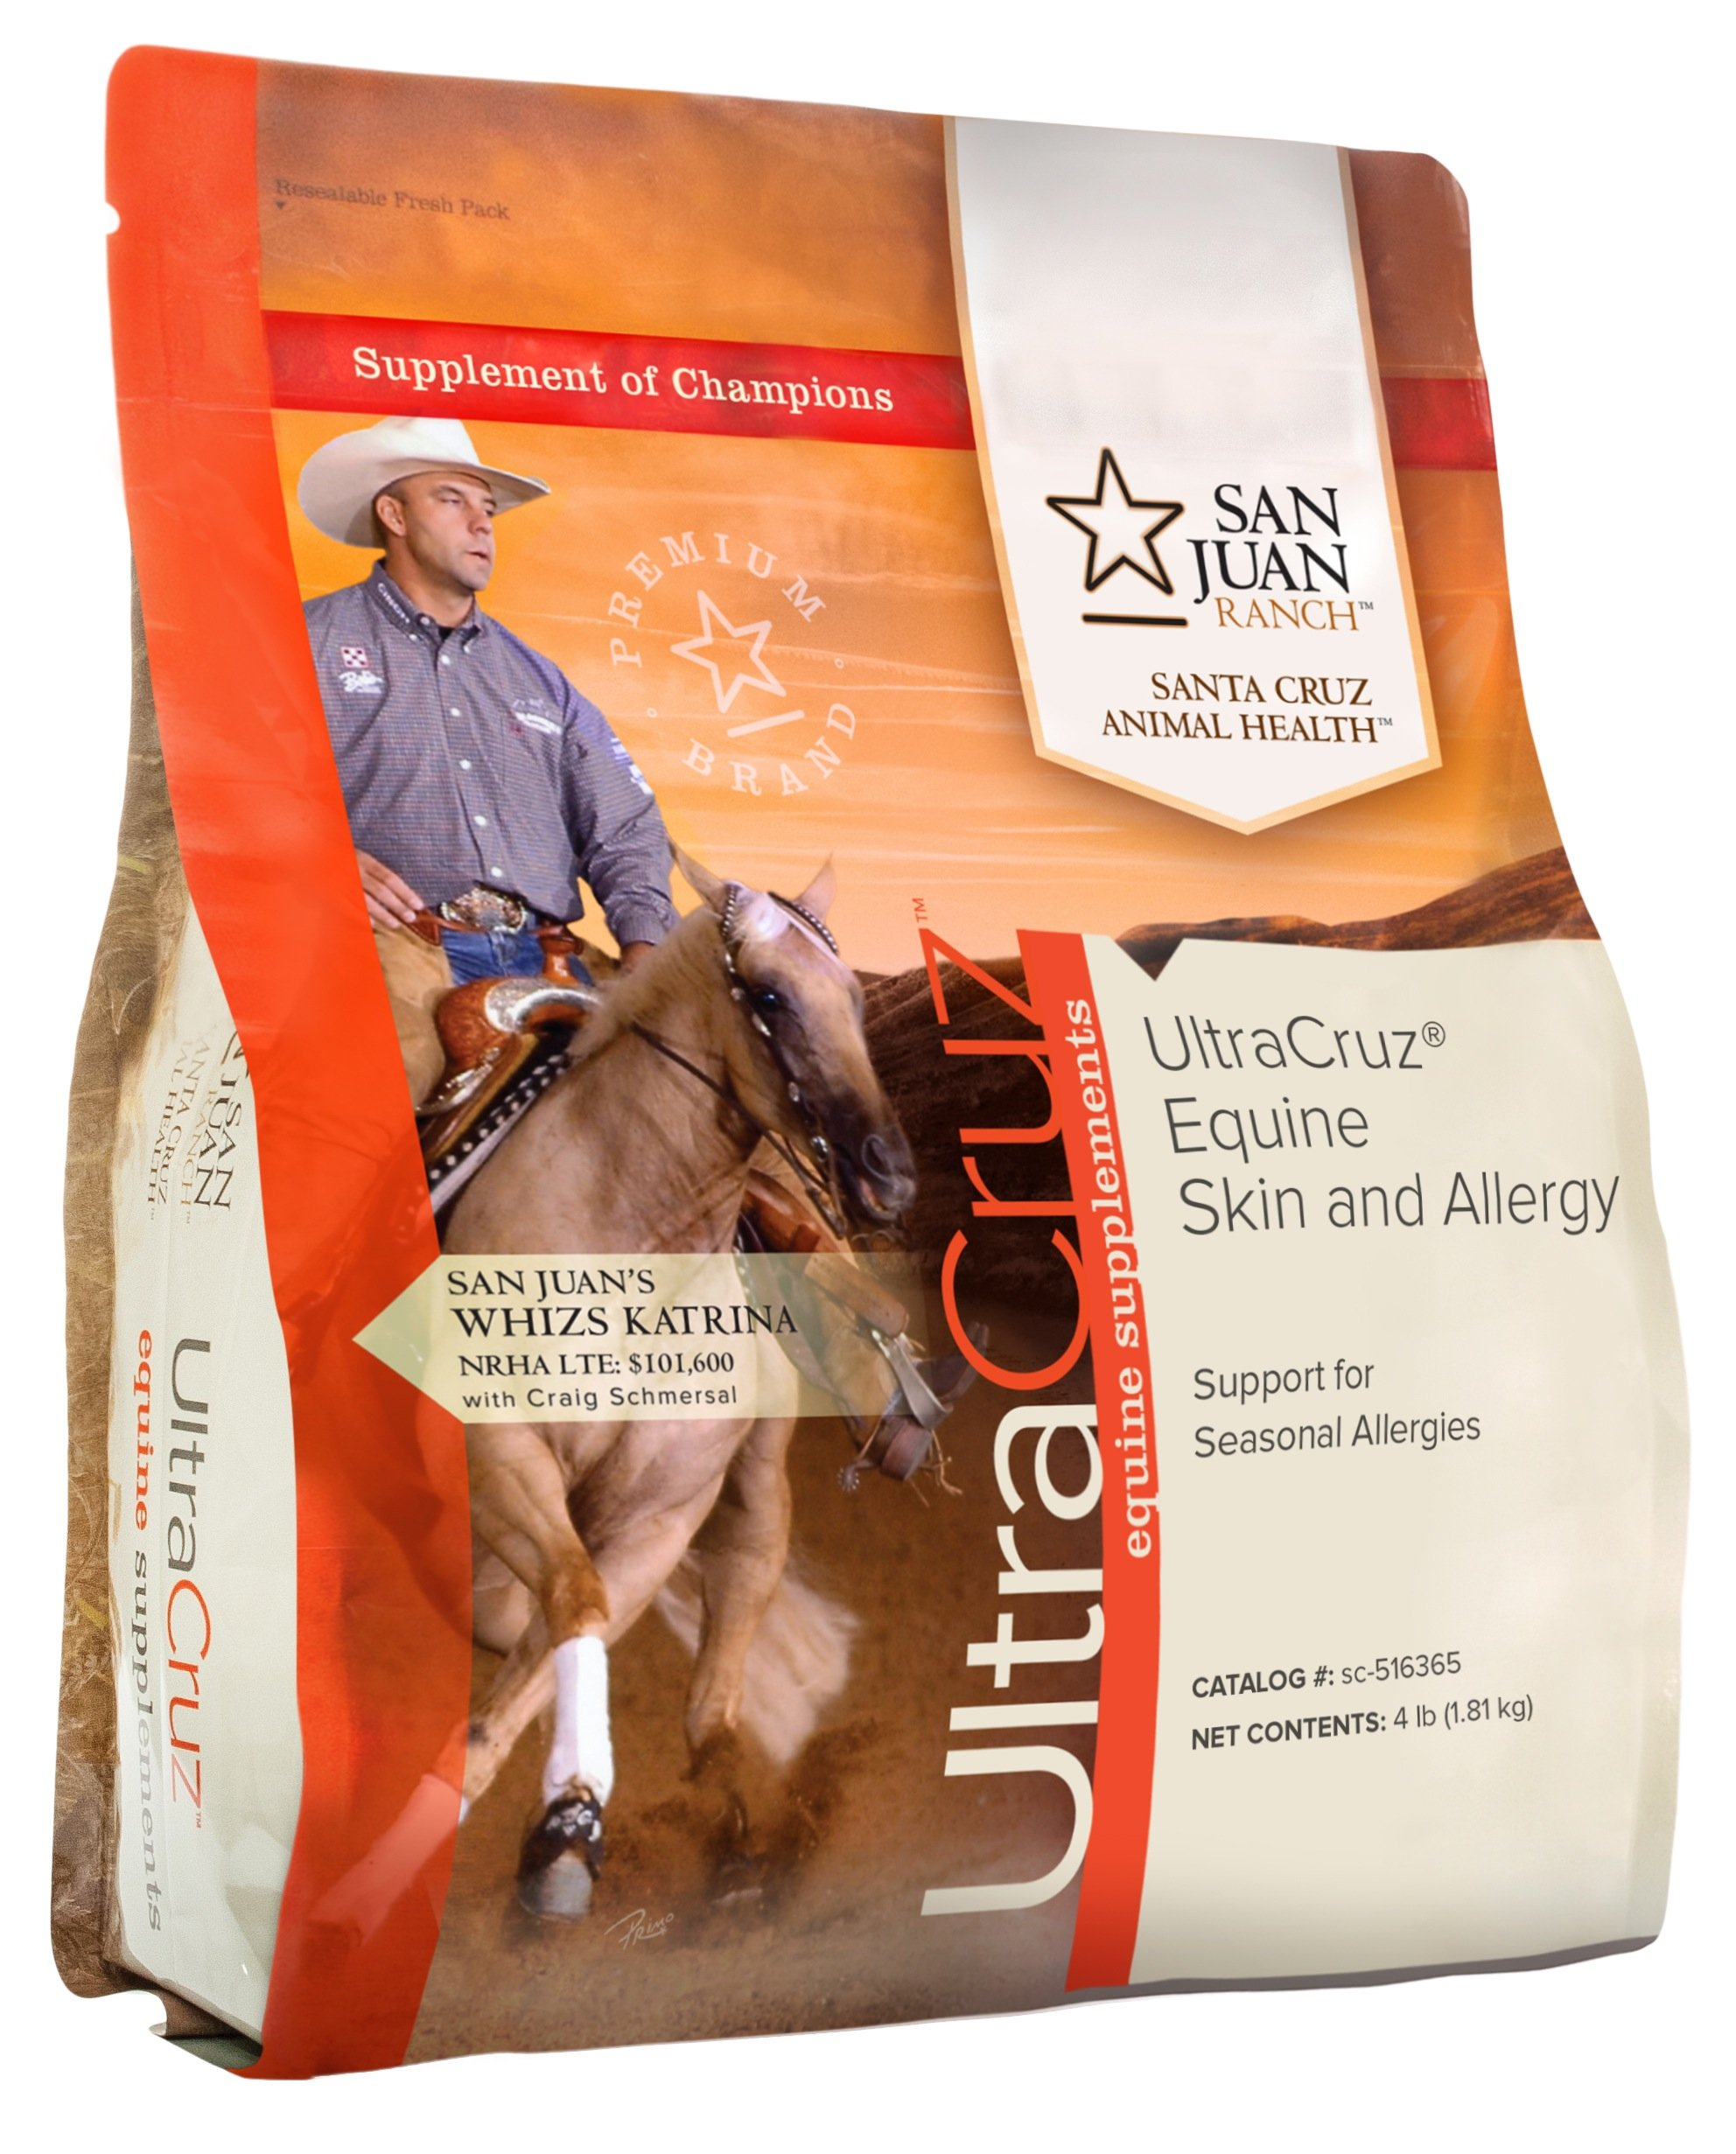 UltraCruz Equine Skin and Allergy Supplement for Horses, 4 lb, Pellet, (31 Day Supply)